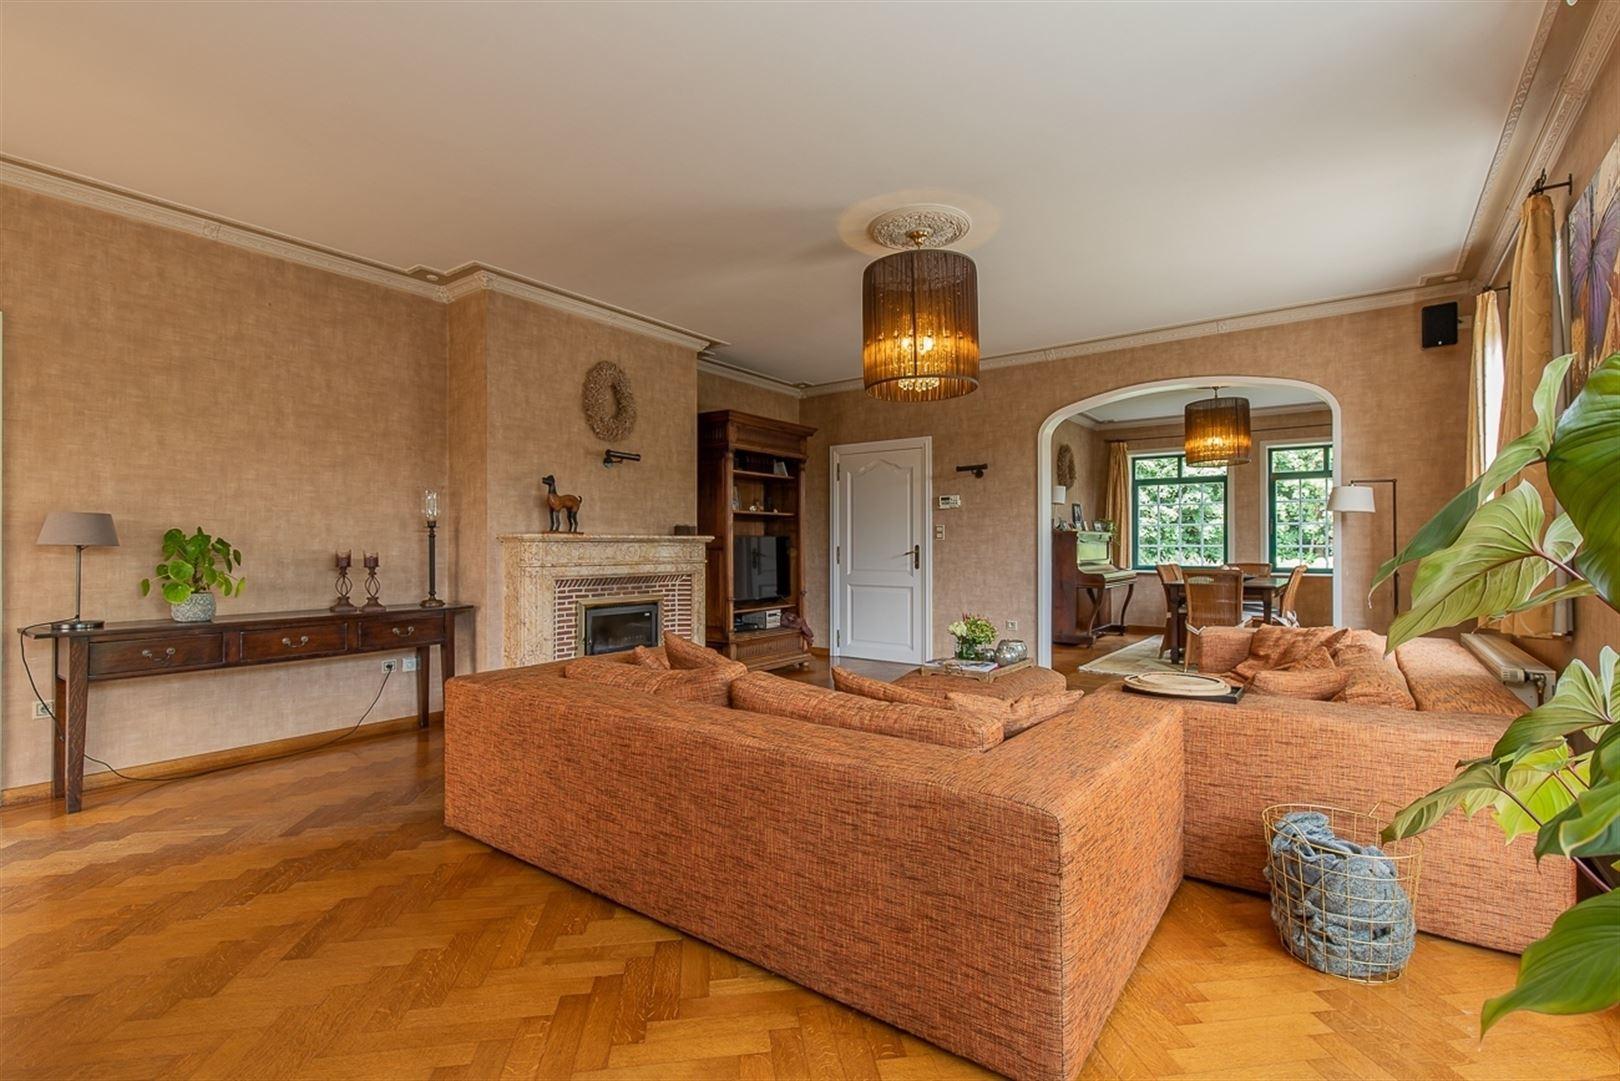 Foto 6 : Woning te 9280 LEBBEKE (België) - Prijs € 469.000